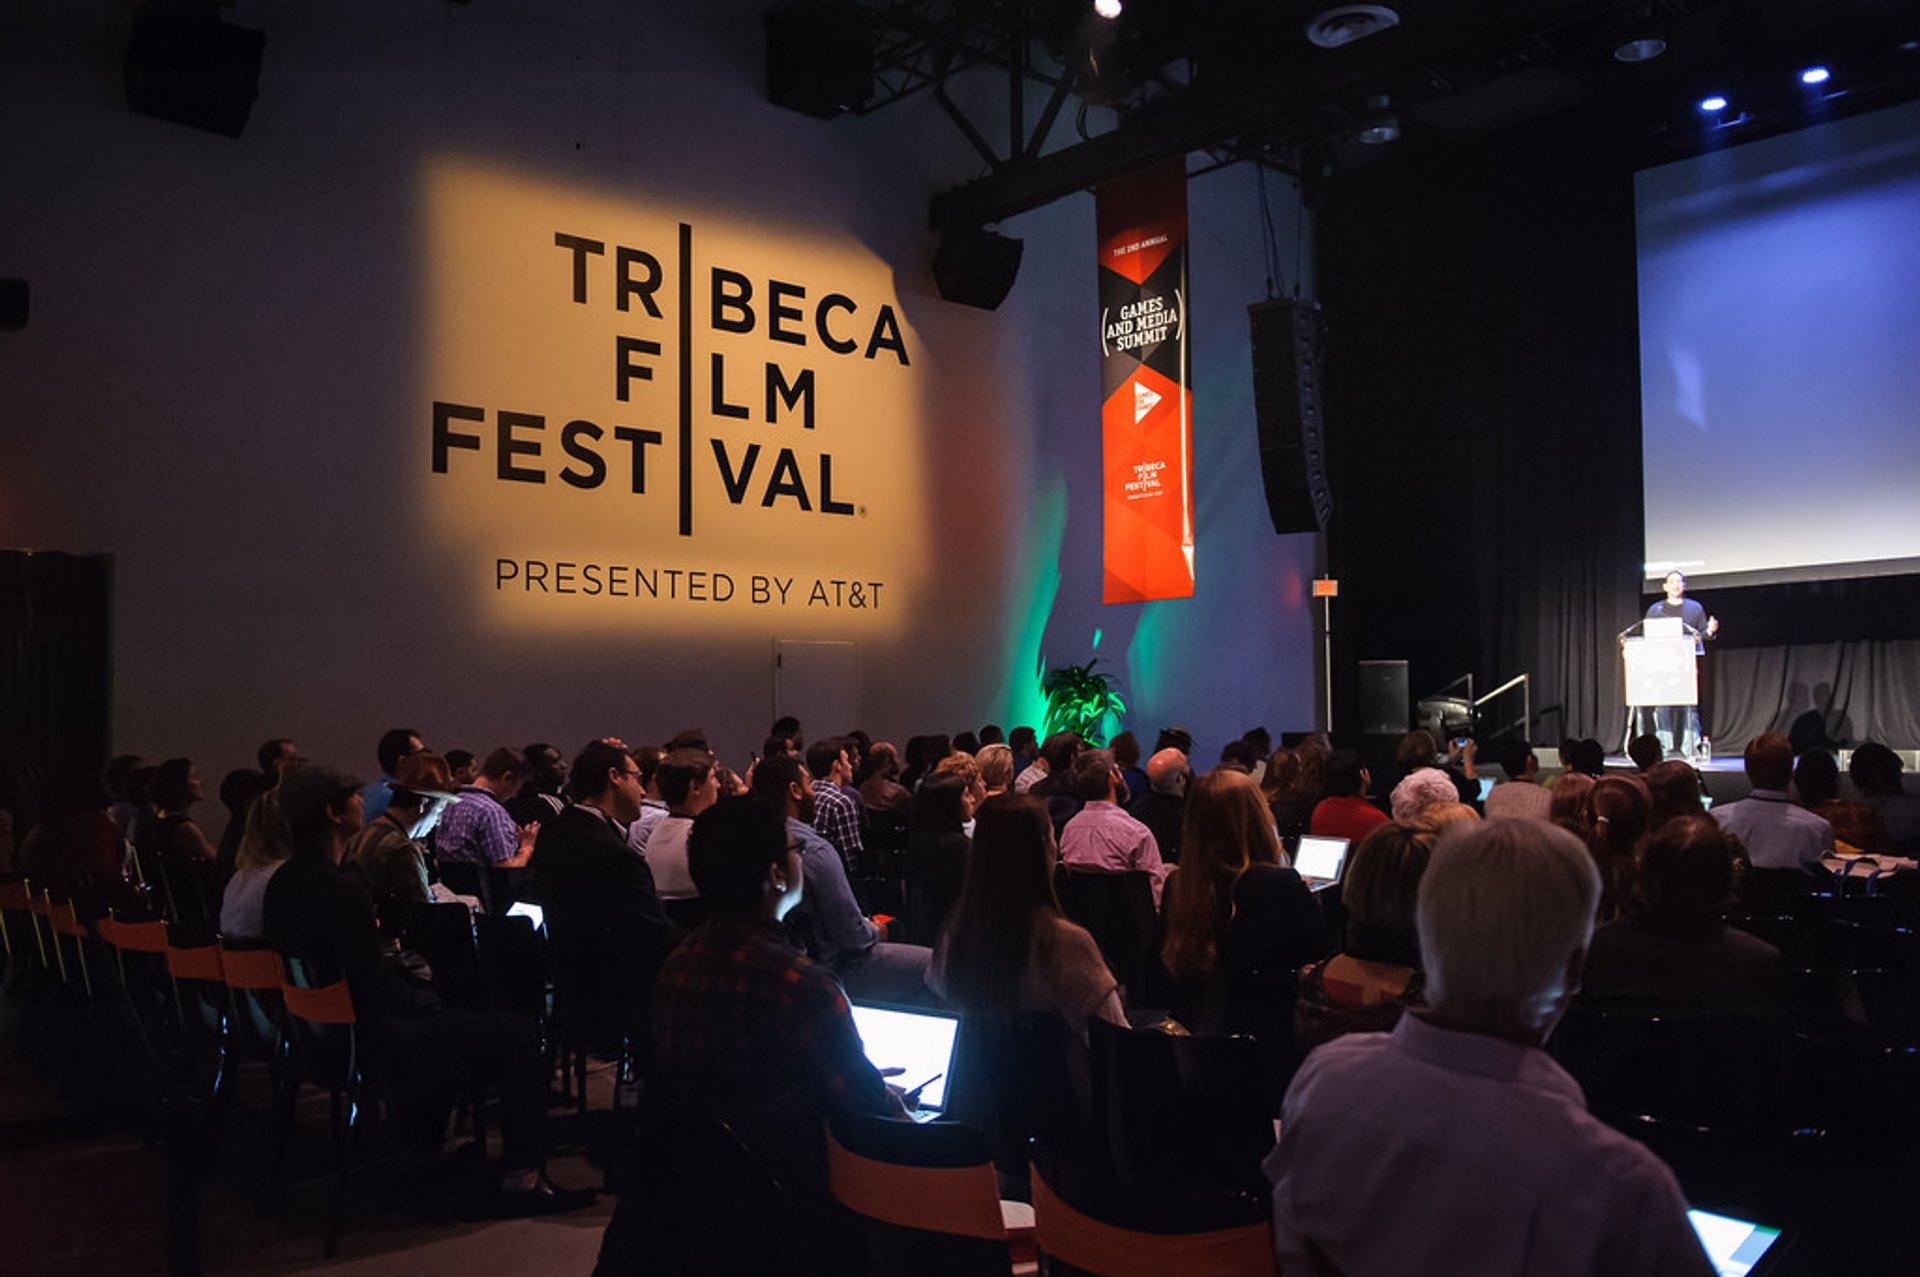 Tribeca Film Festival in New York 2020 - Best Time